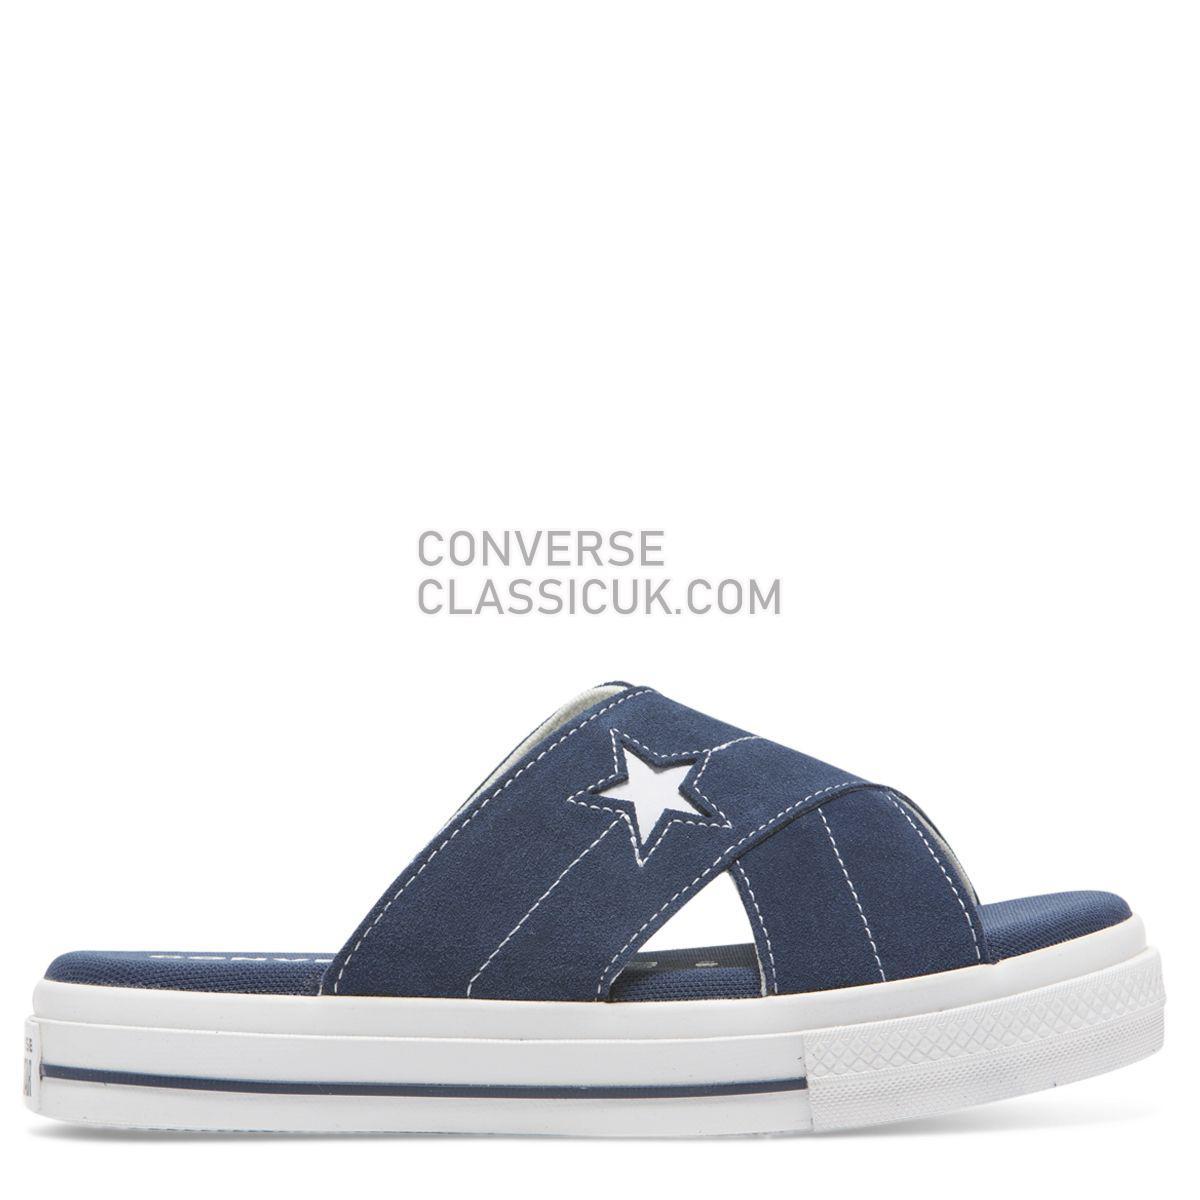 Converse One Star Sandal Slip Navy Womens 564147 Navy/Egret/White Shoes